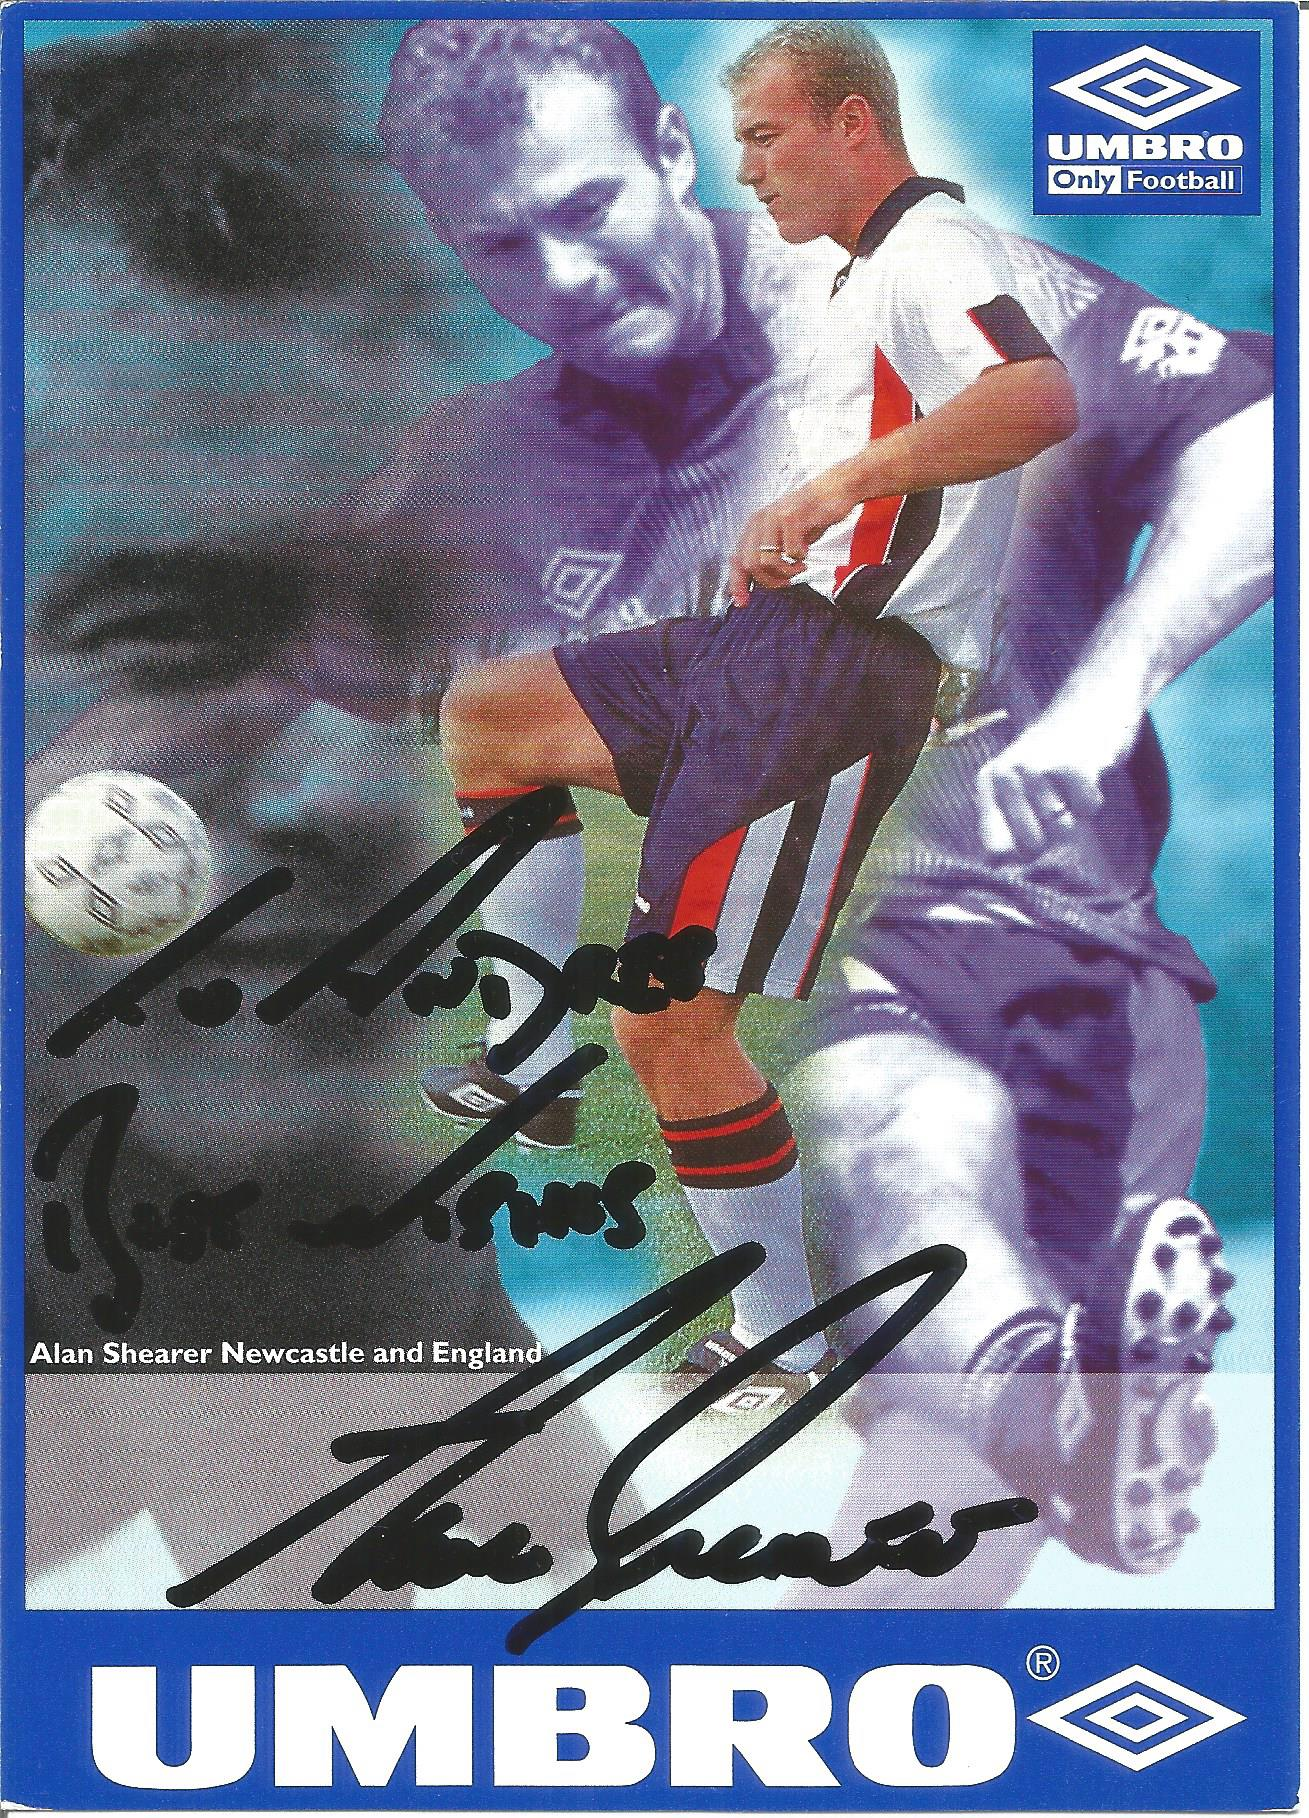 Alan Shearer Signed England Umbro Promo Photocard. Good Condition. All autographs are genuine hand